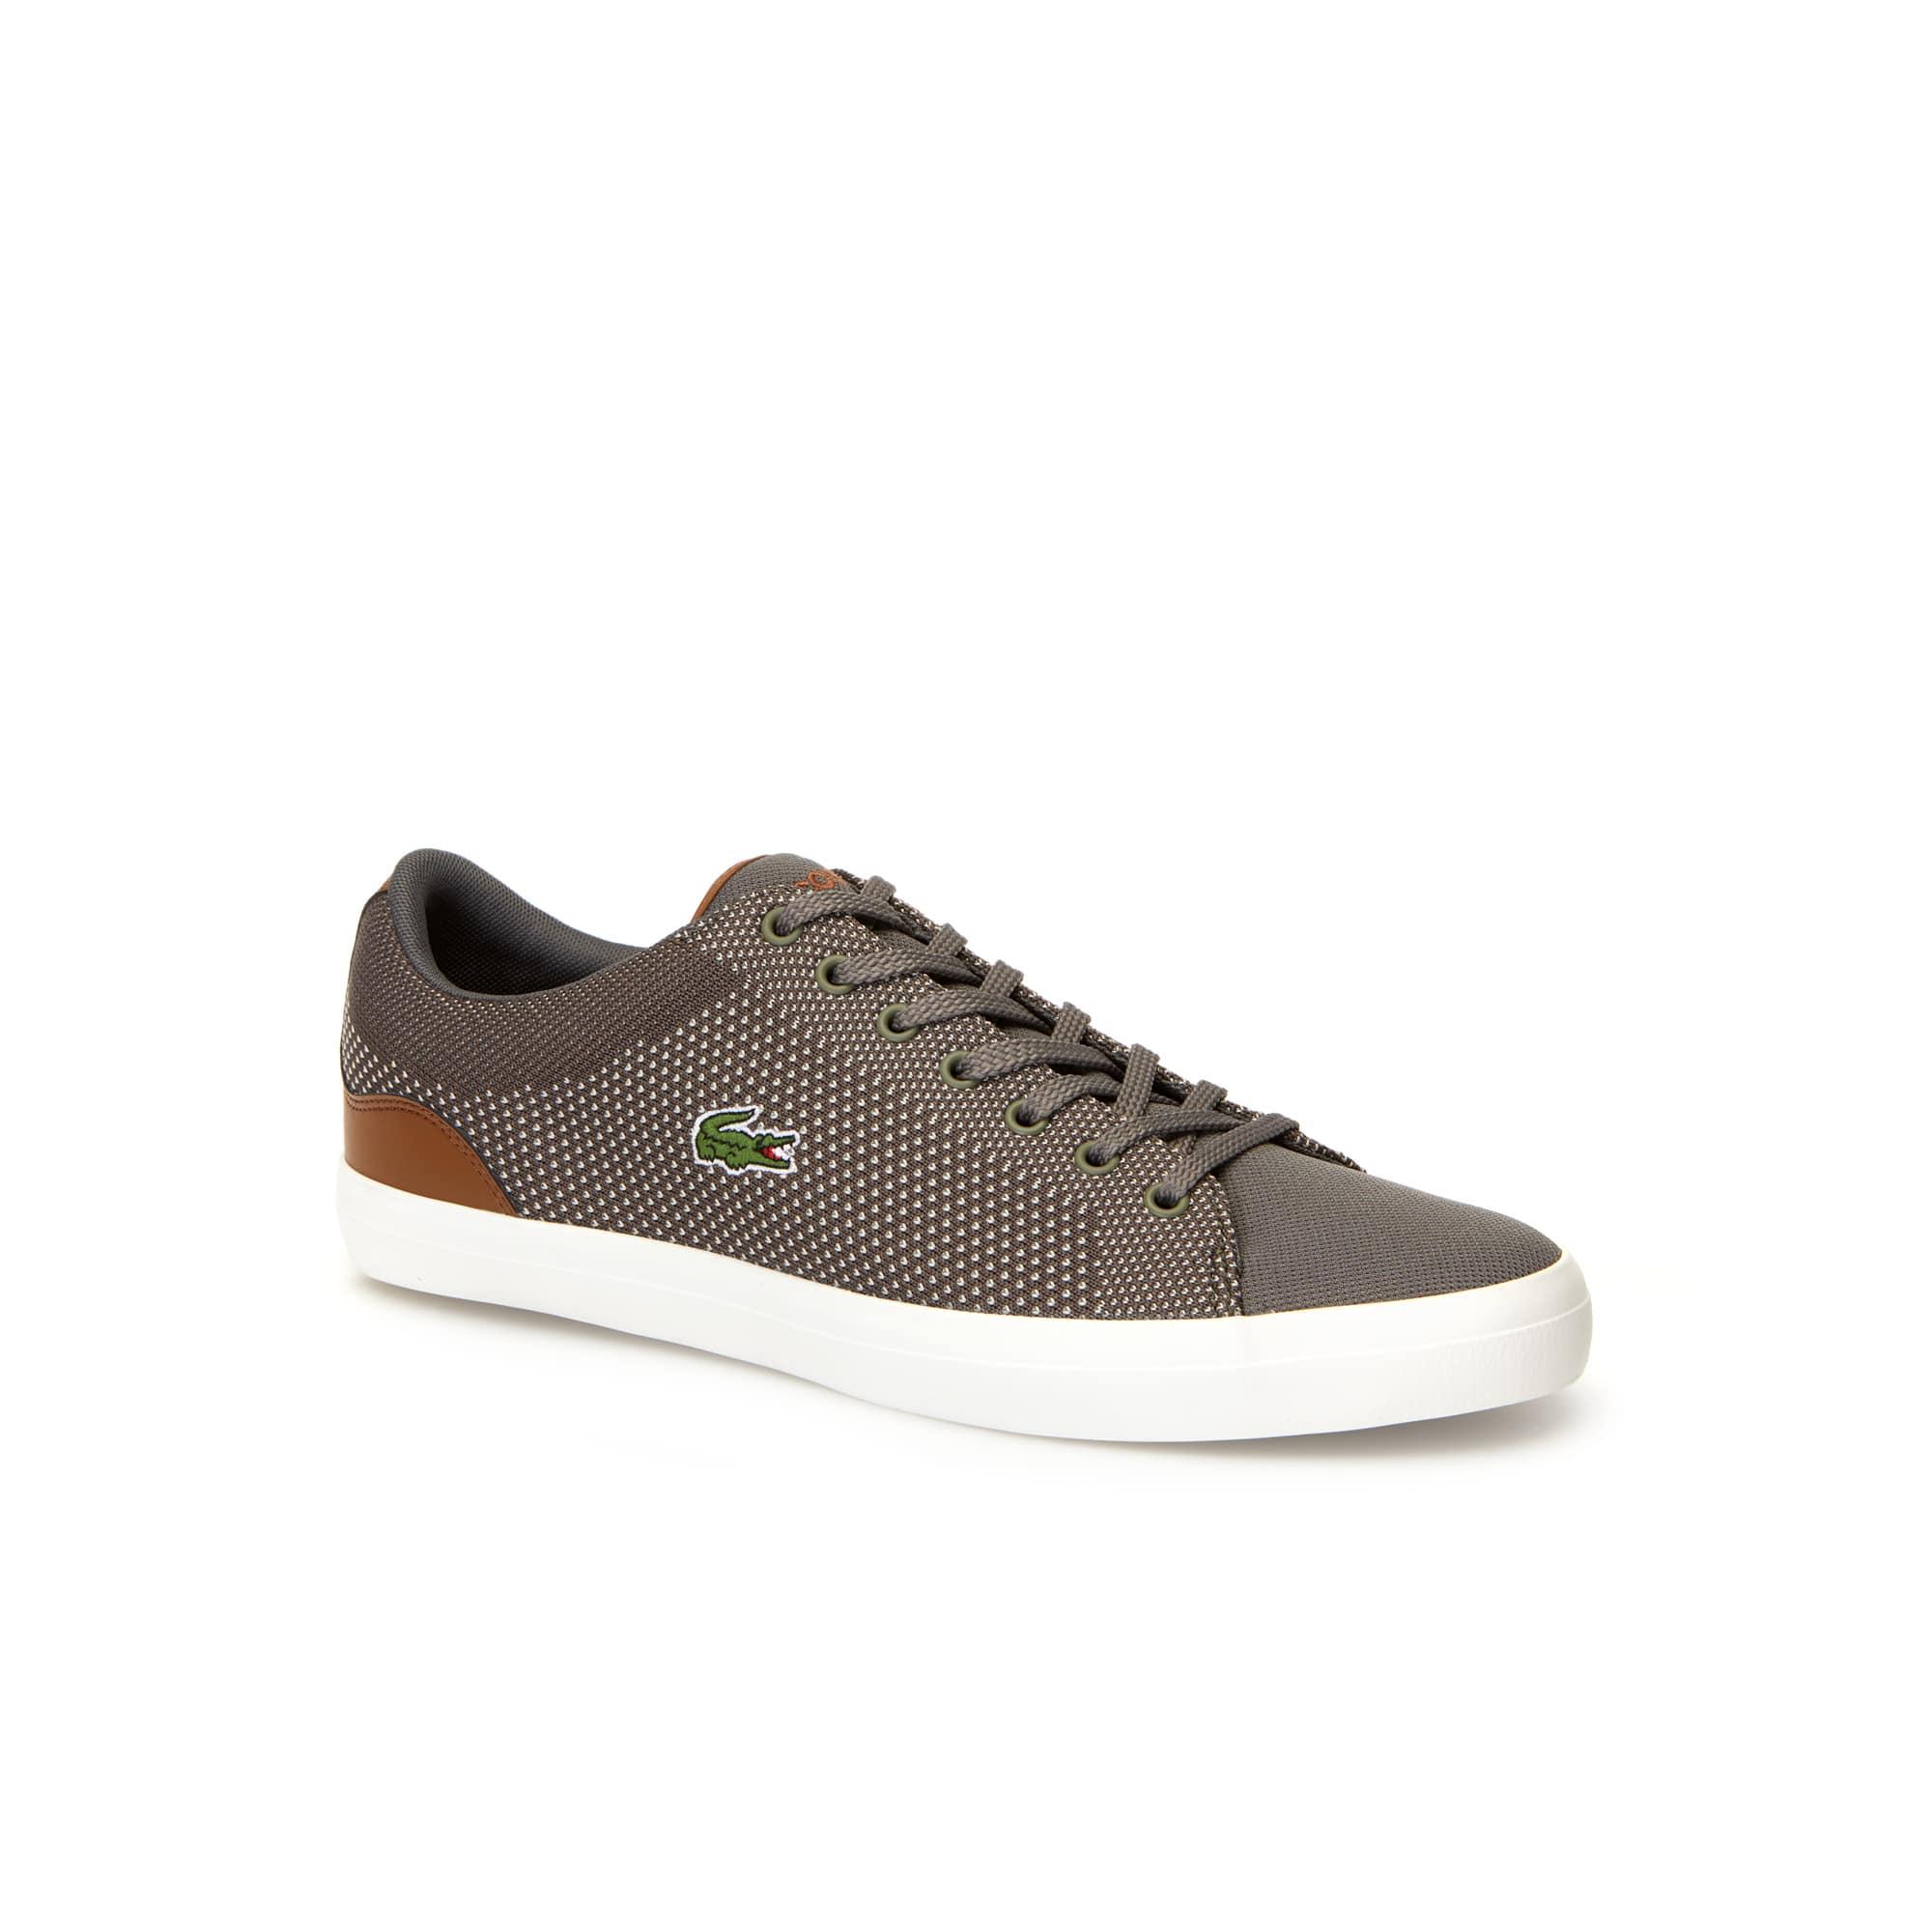 Sneakers Lerond homme textile jacquard